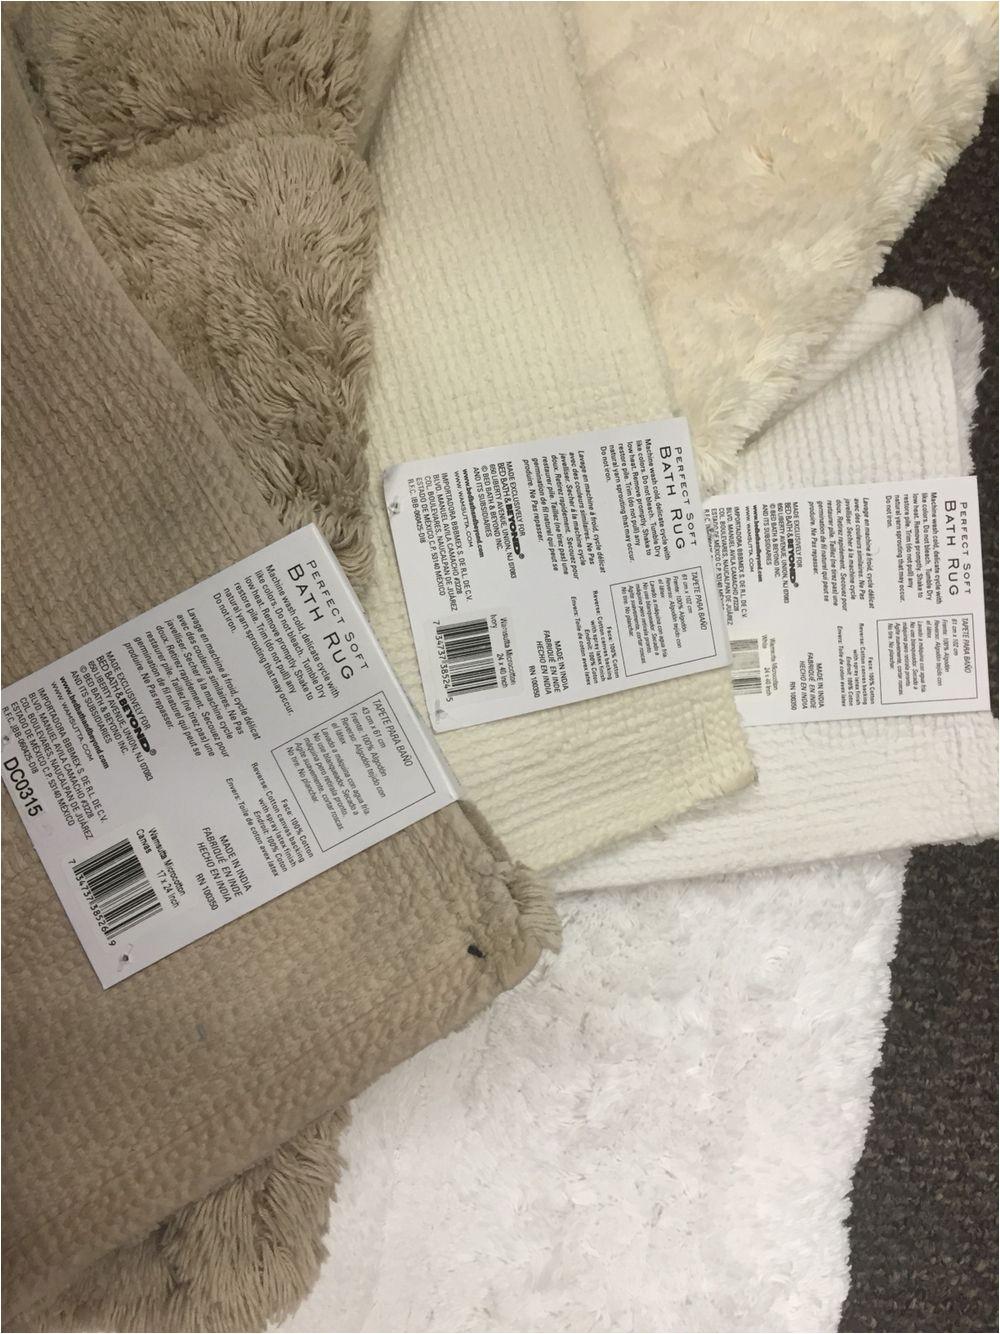 Wamsutta Perfect soft Bath Rug Wamsutta Perfect soft Micro Cotton 30 Inch X 48 Inch Bath